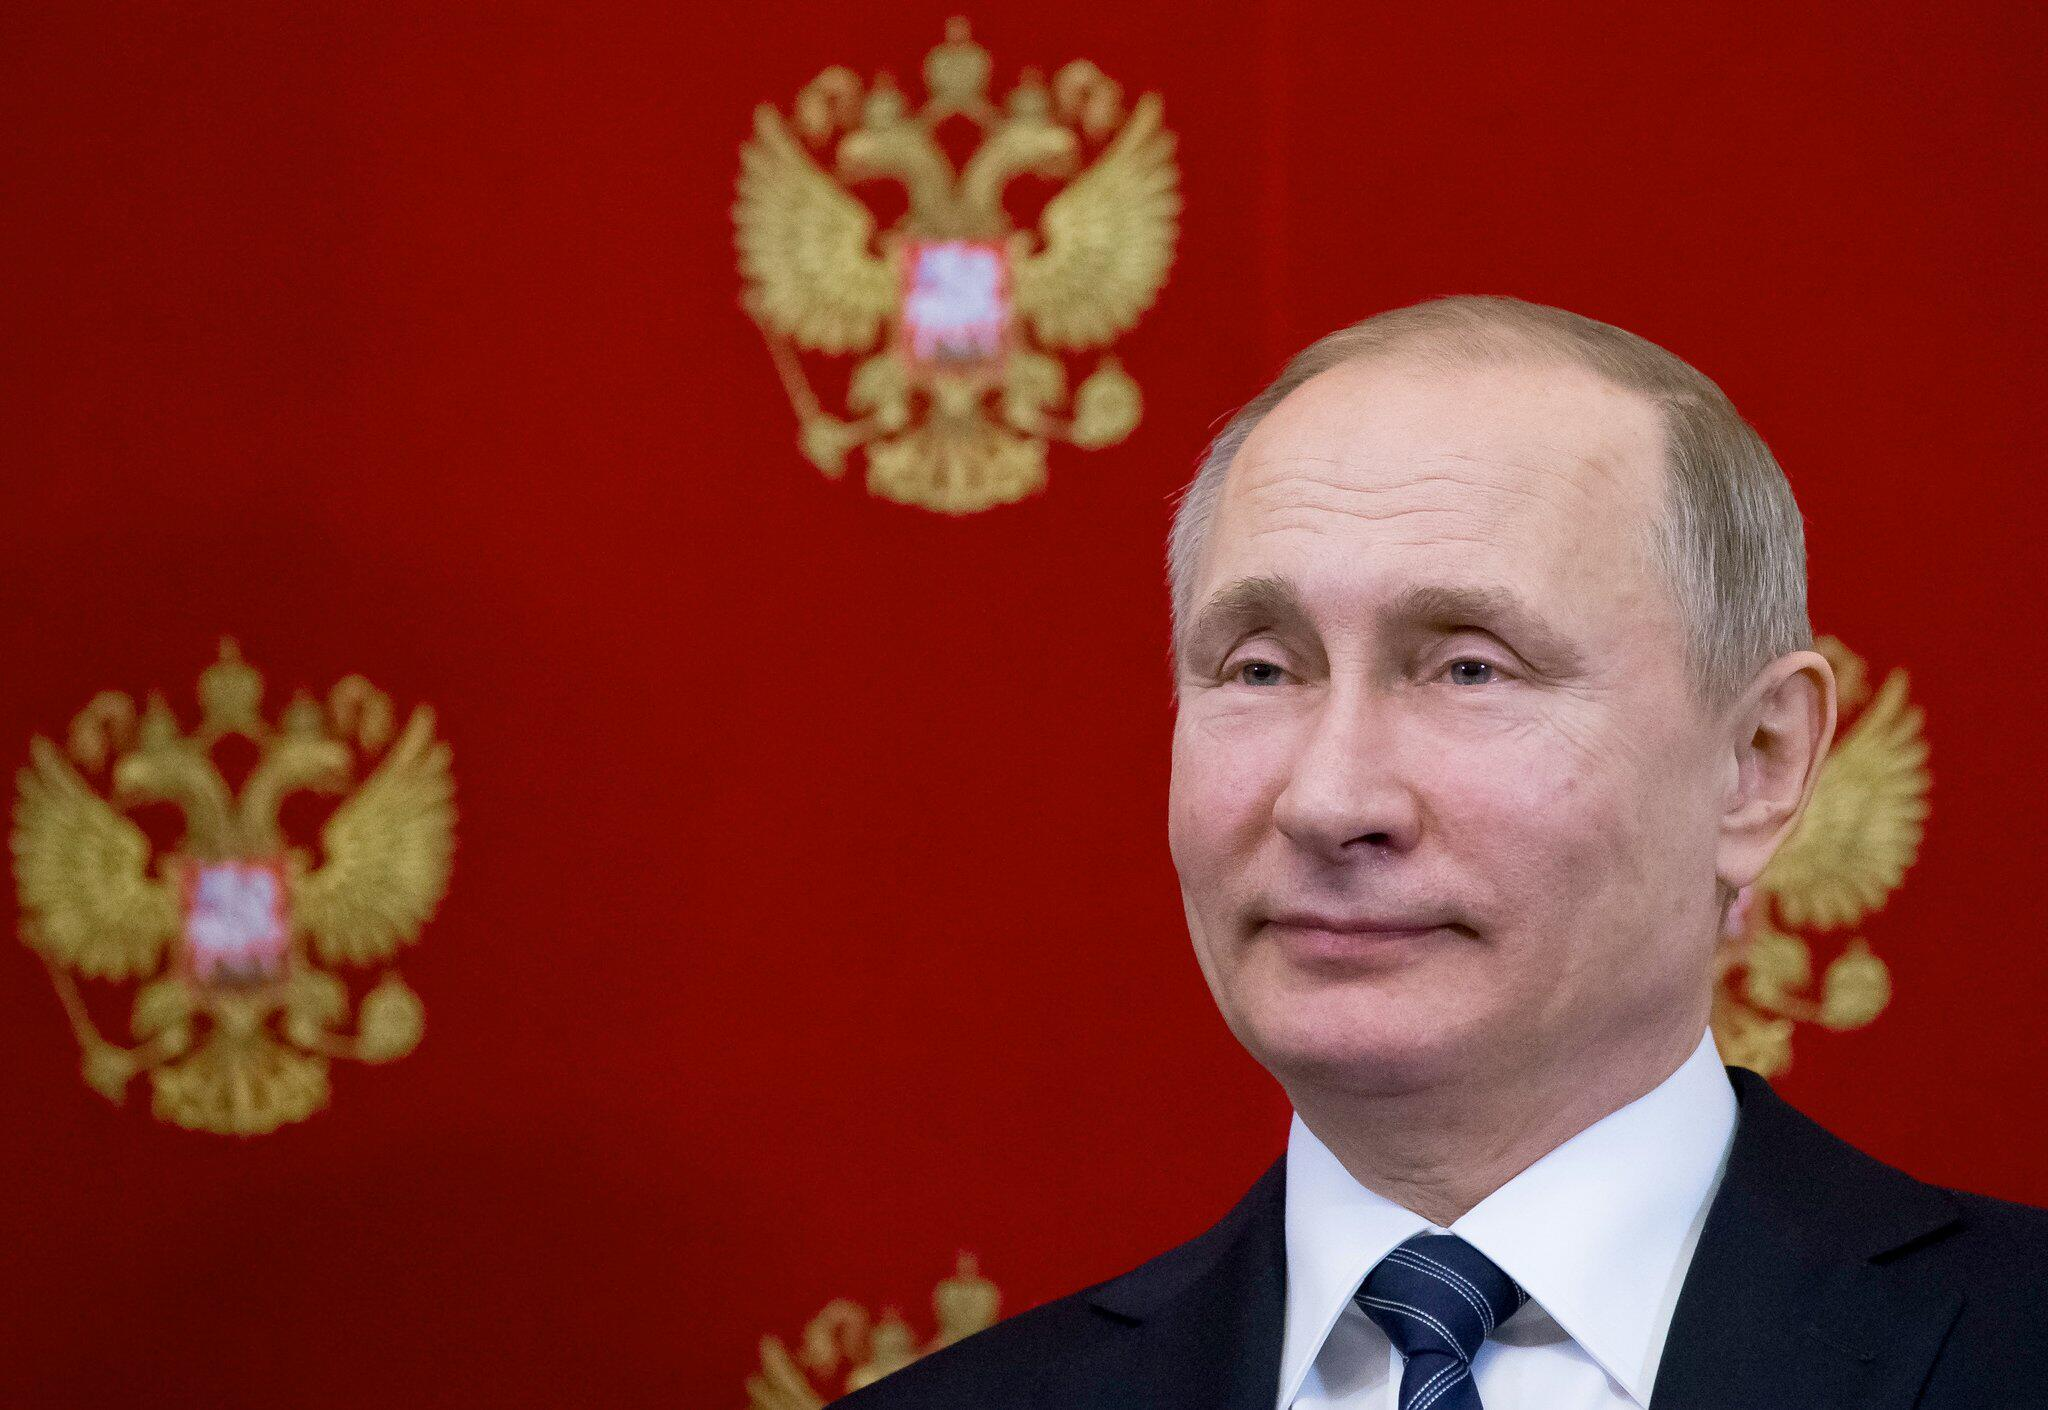 Bild zu Wladimir Putin, Giftgasanschlag, London, Russland,